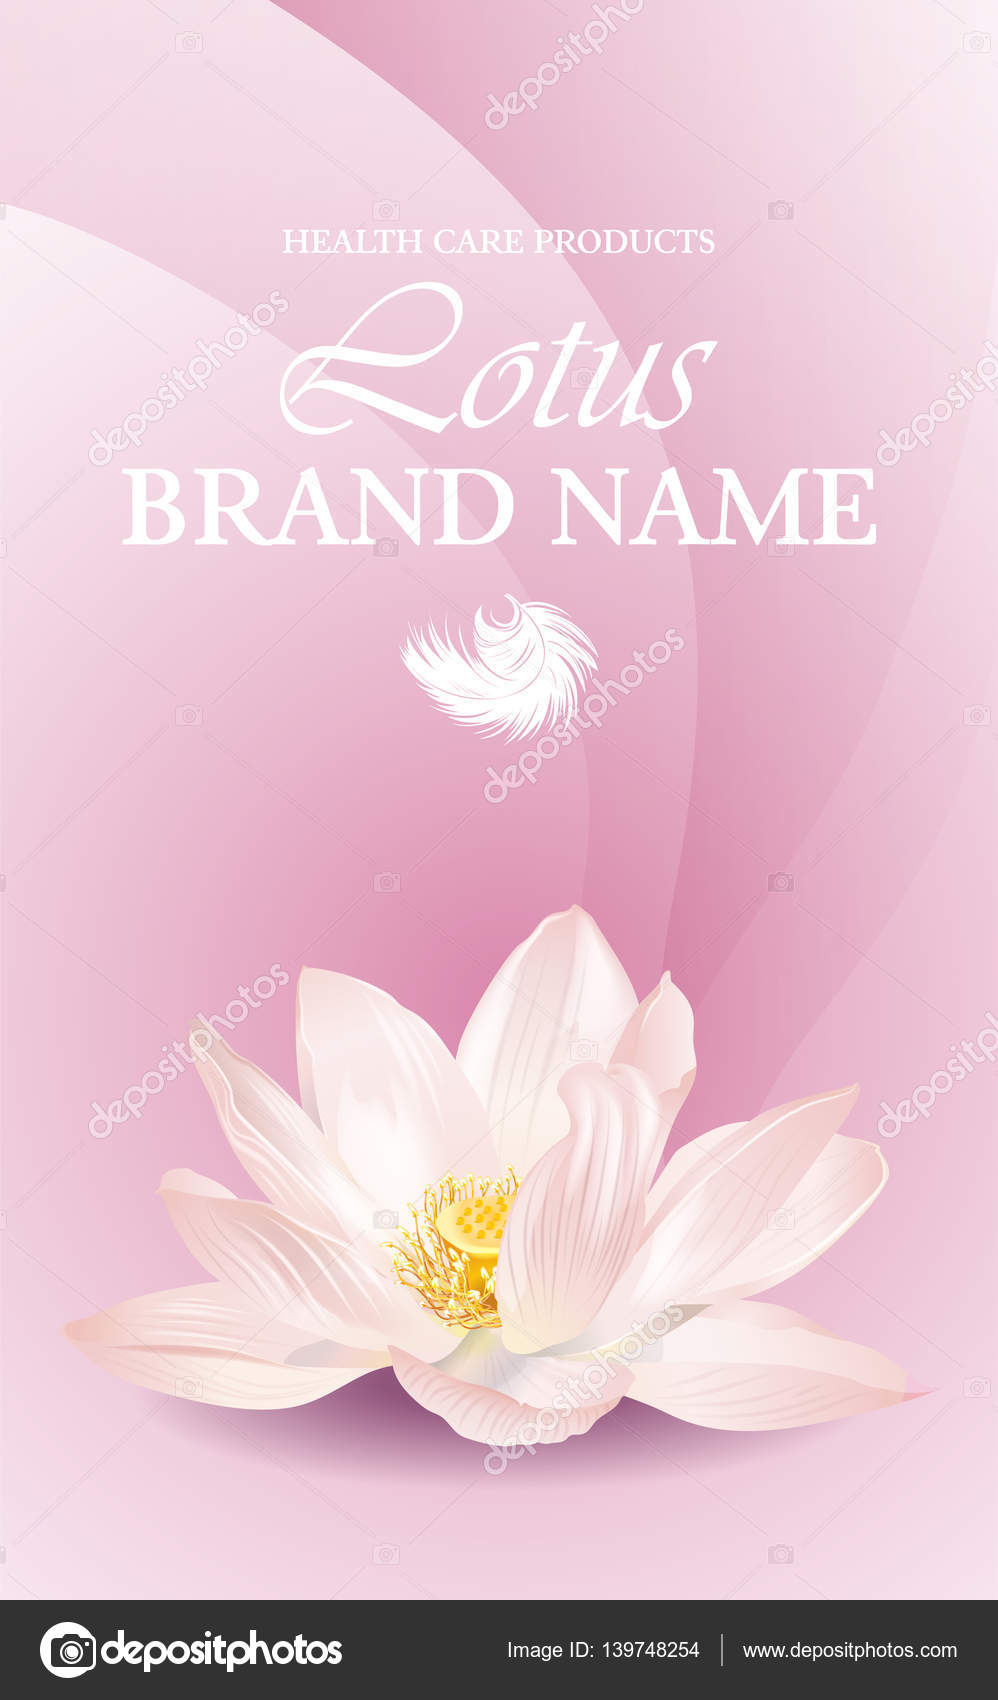 Lotus-Blume-banner — Stockvektor © PurpleBird18 #139748254